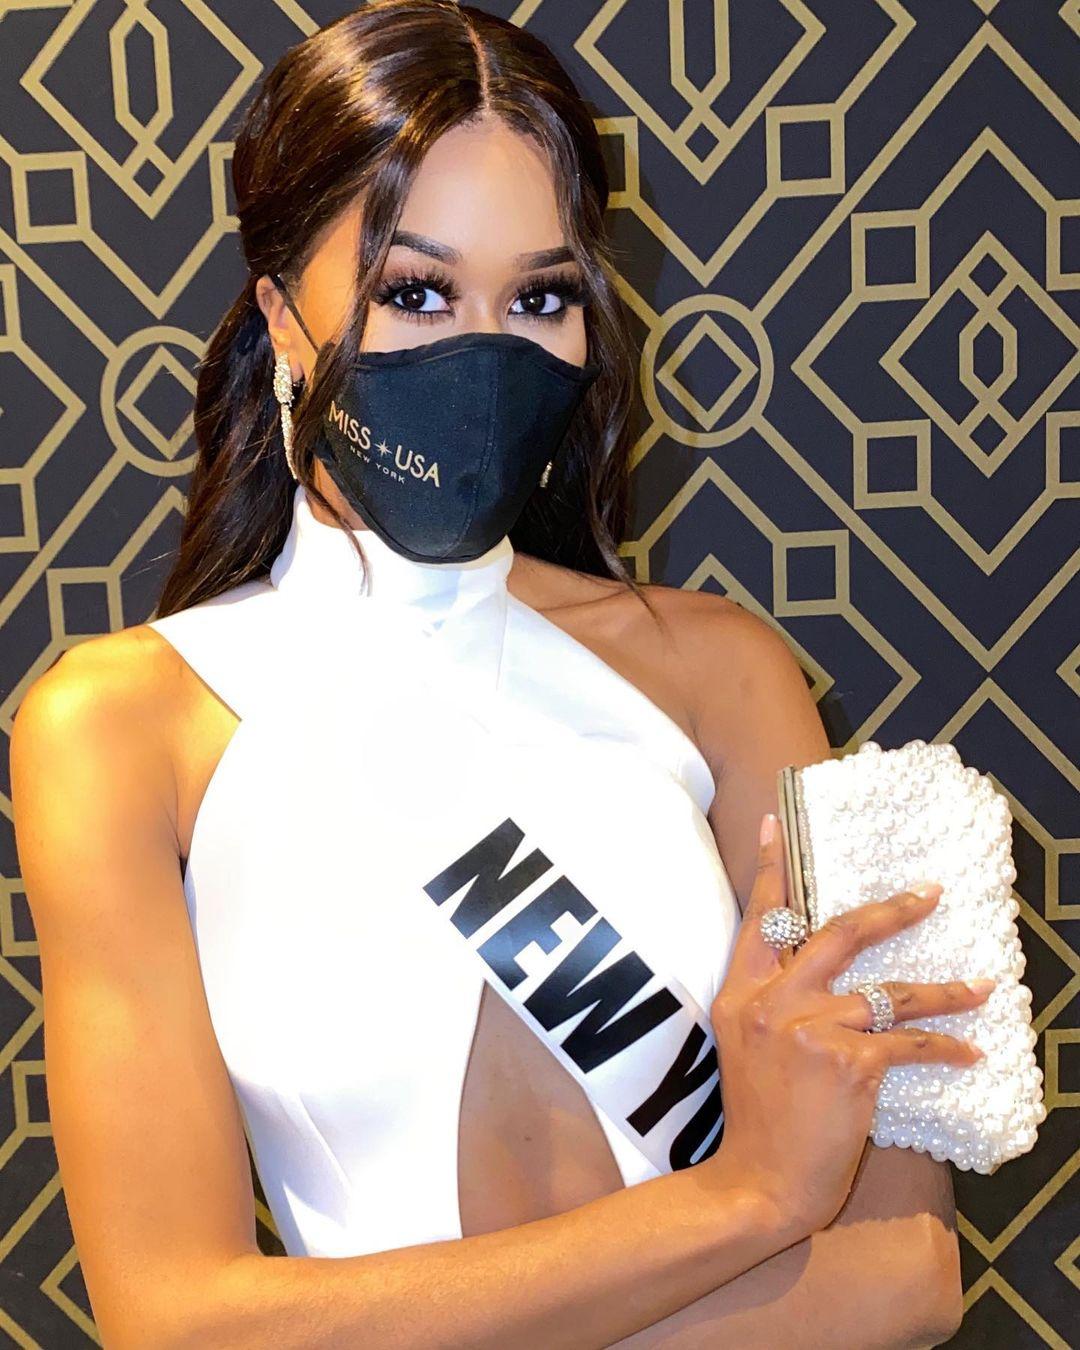 andreia gibau, top 10 de miss usa 2020/top 16 de miss earth 2017. - Página 17 Andrei22